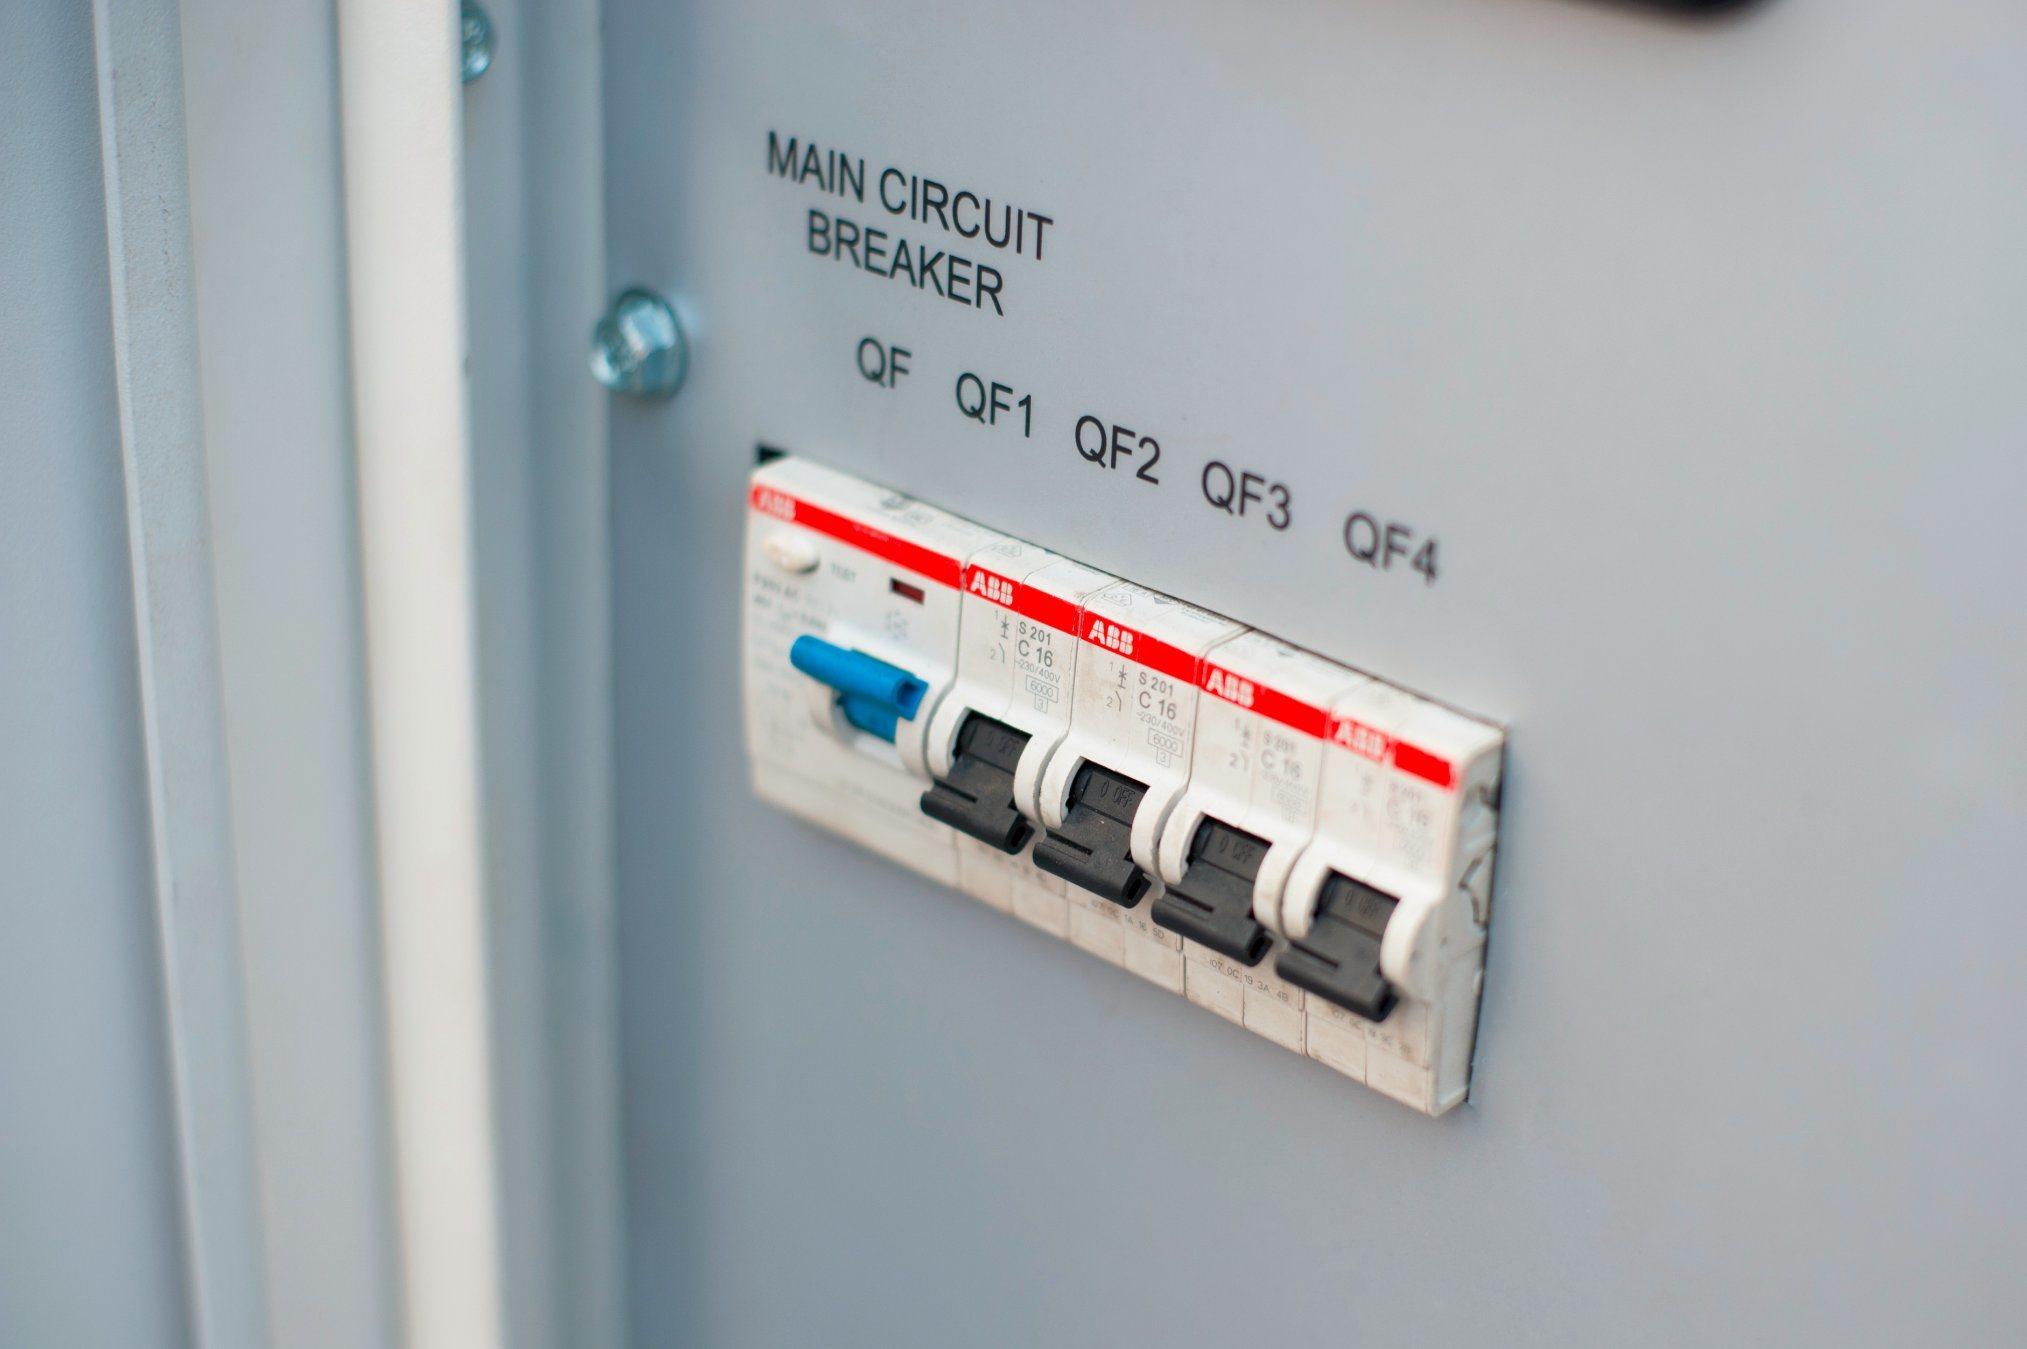 Kipor Diesel Generator Outdoor Lighting Tower Kl11t